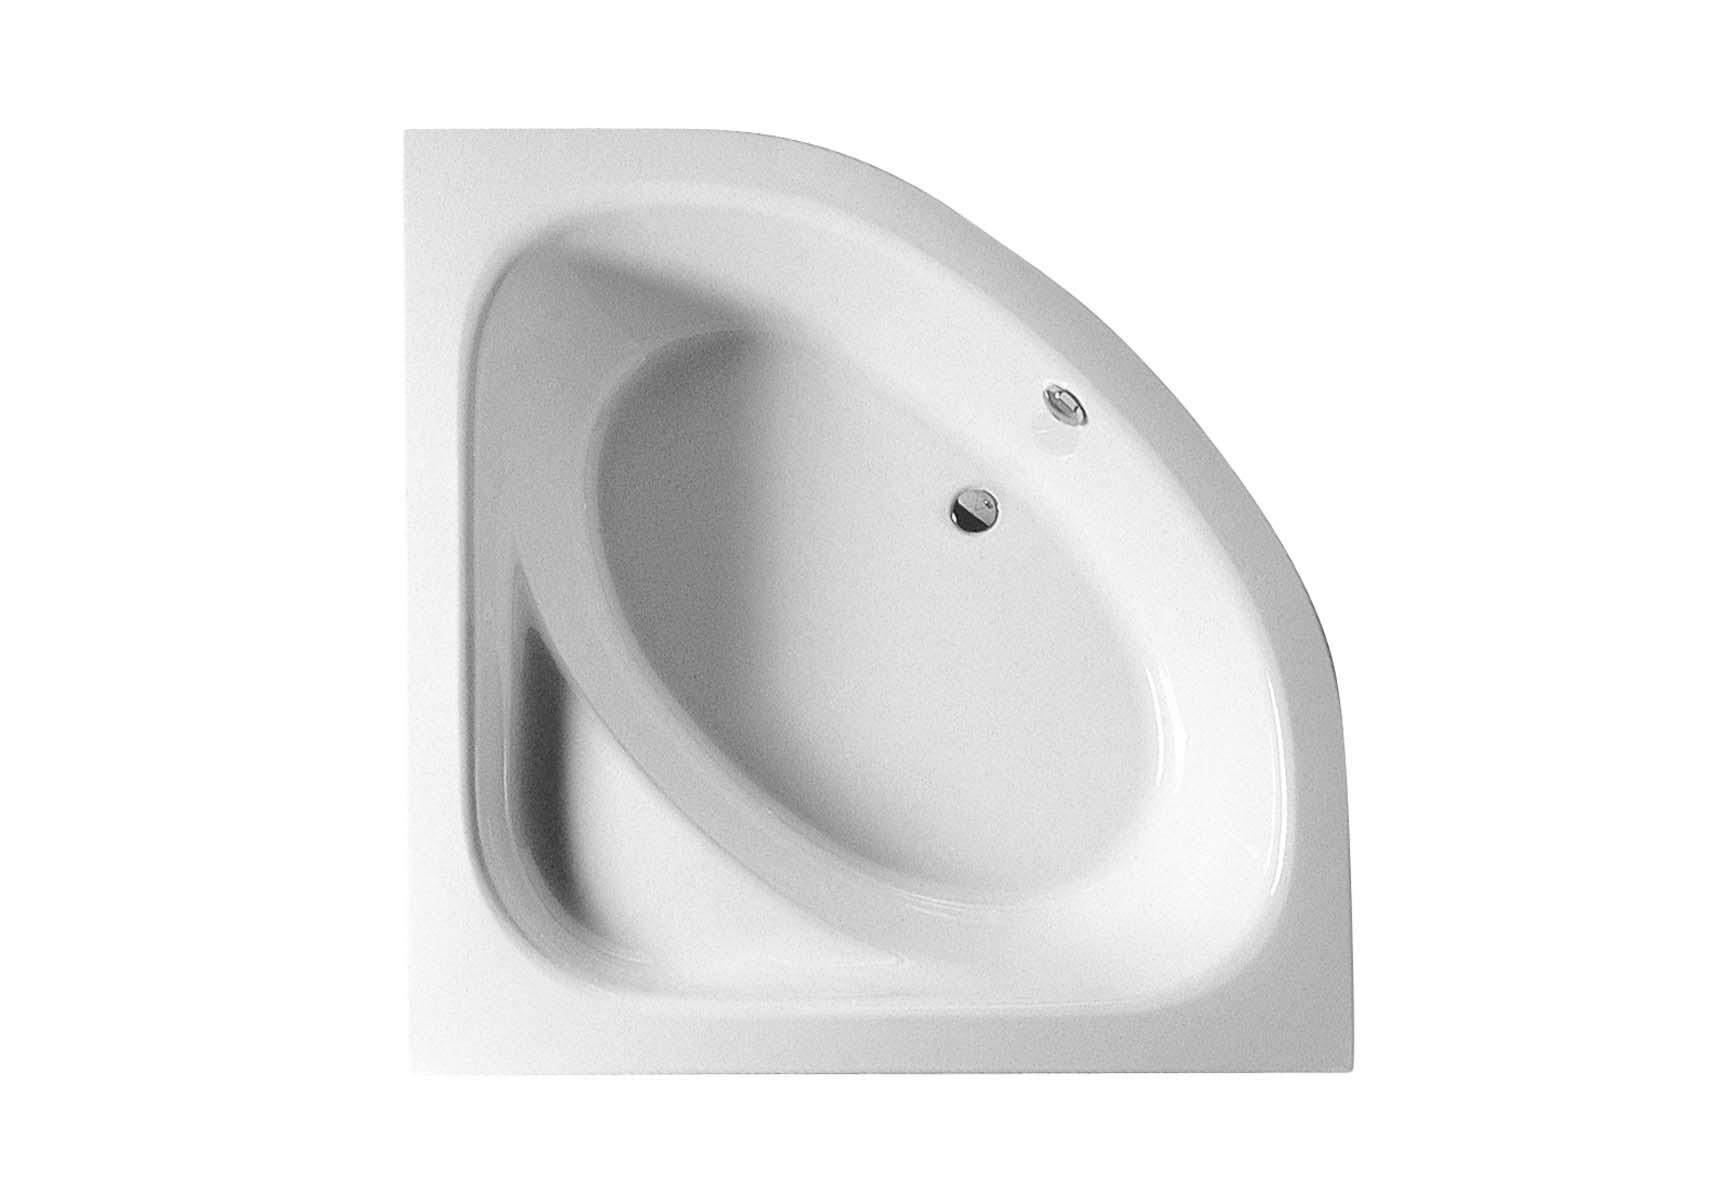 Thera Corner 150x150 cm Aqua Soft Easy-Chrome with Jet